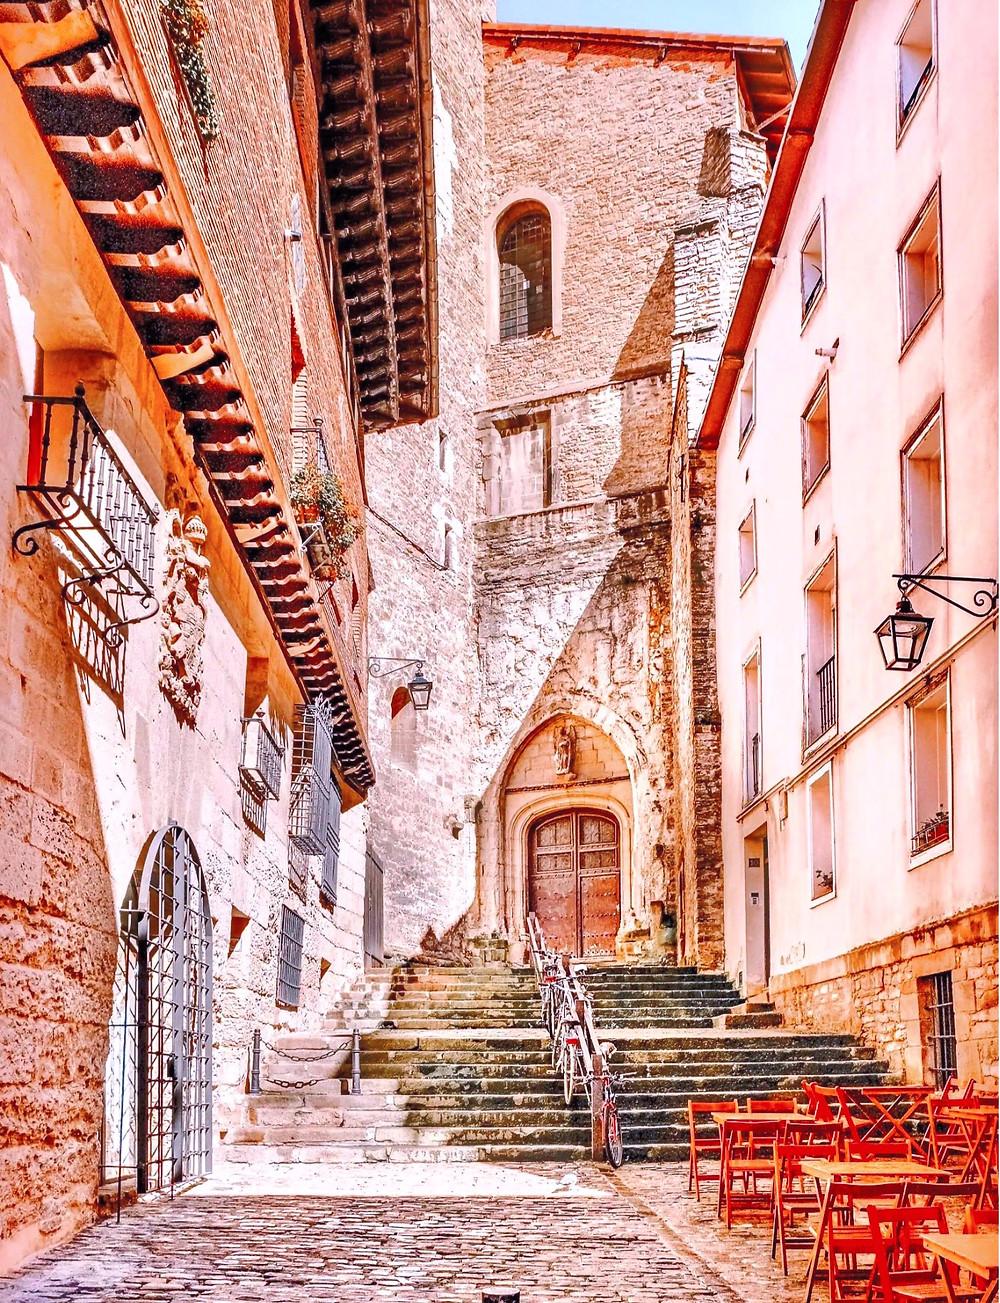 the old town of Vitoria-Gasteiz in Basque Spain